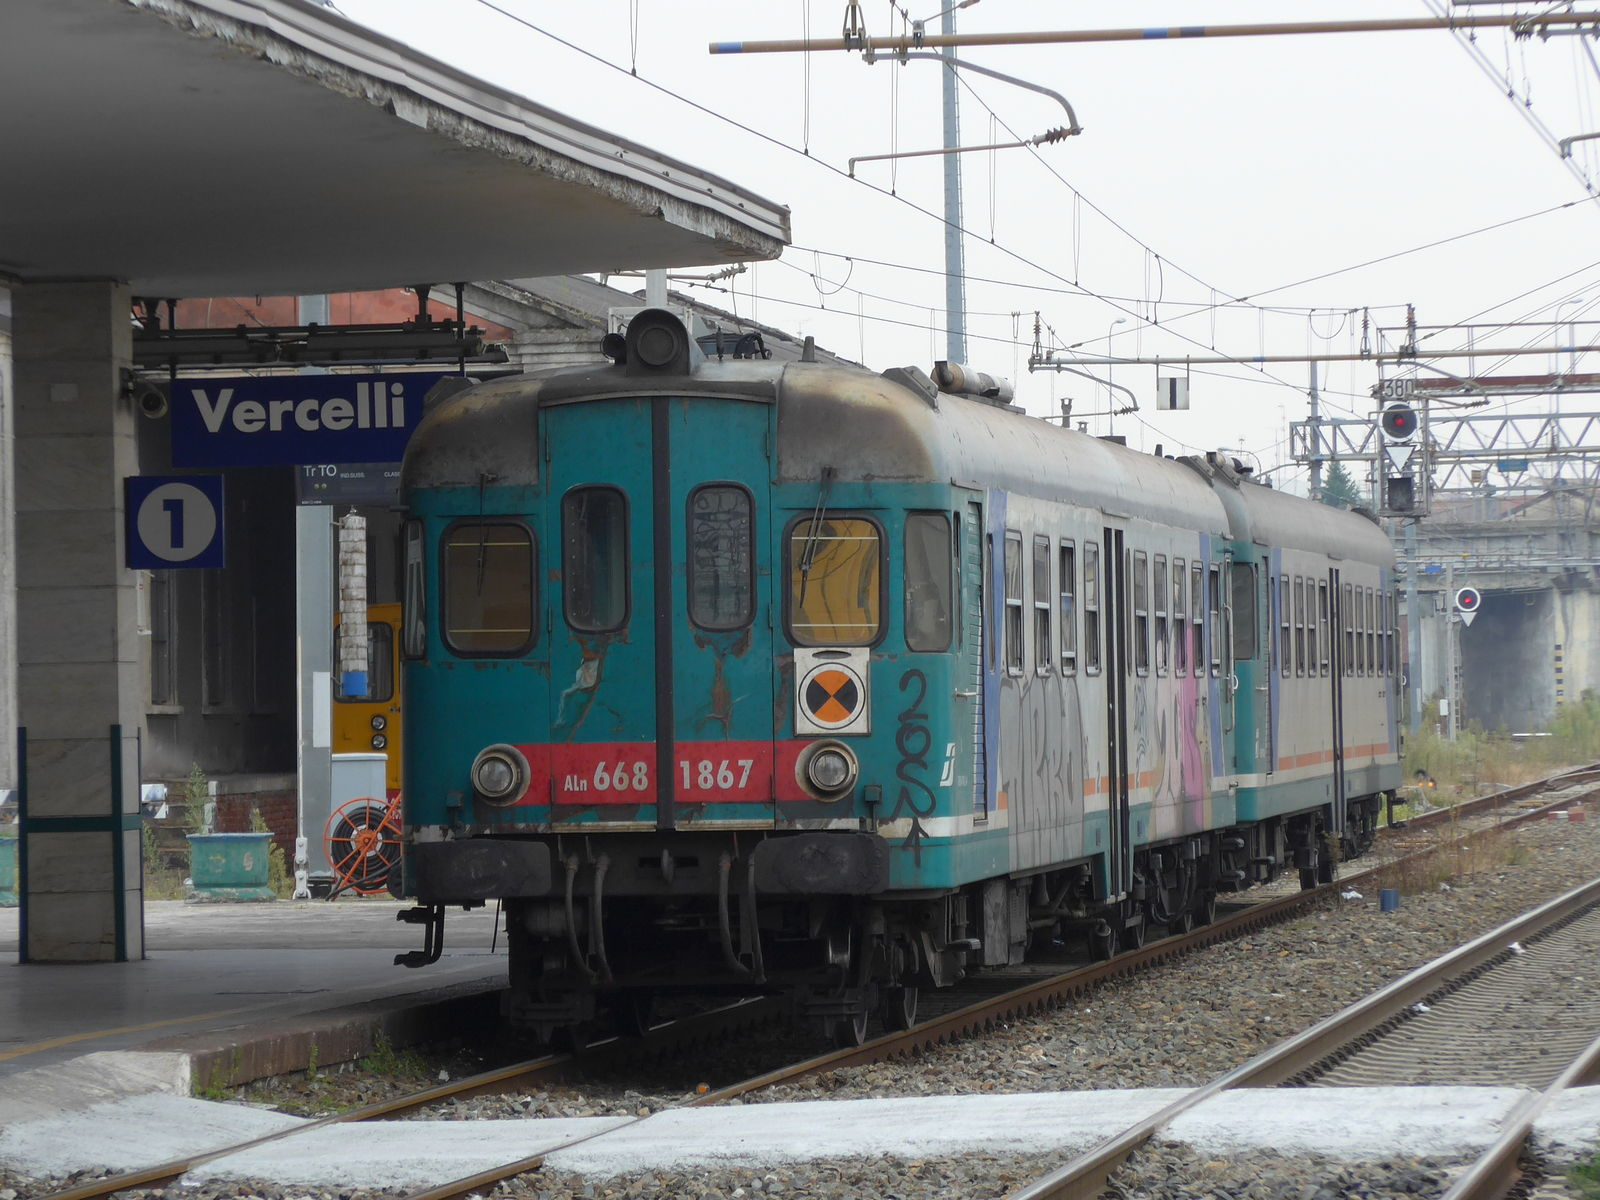 P1000311